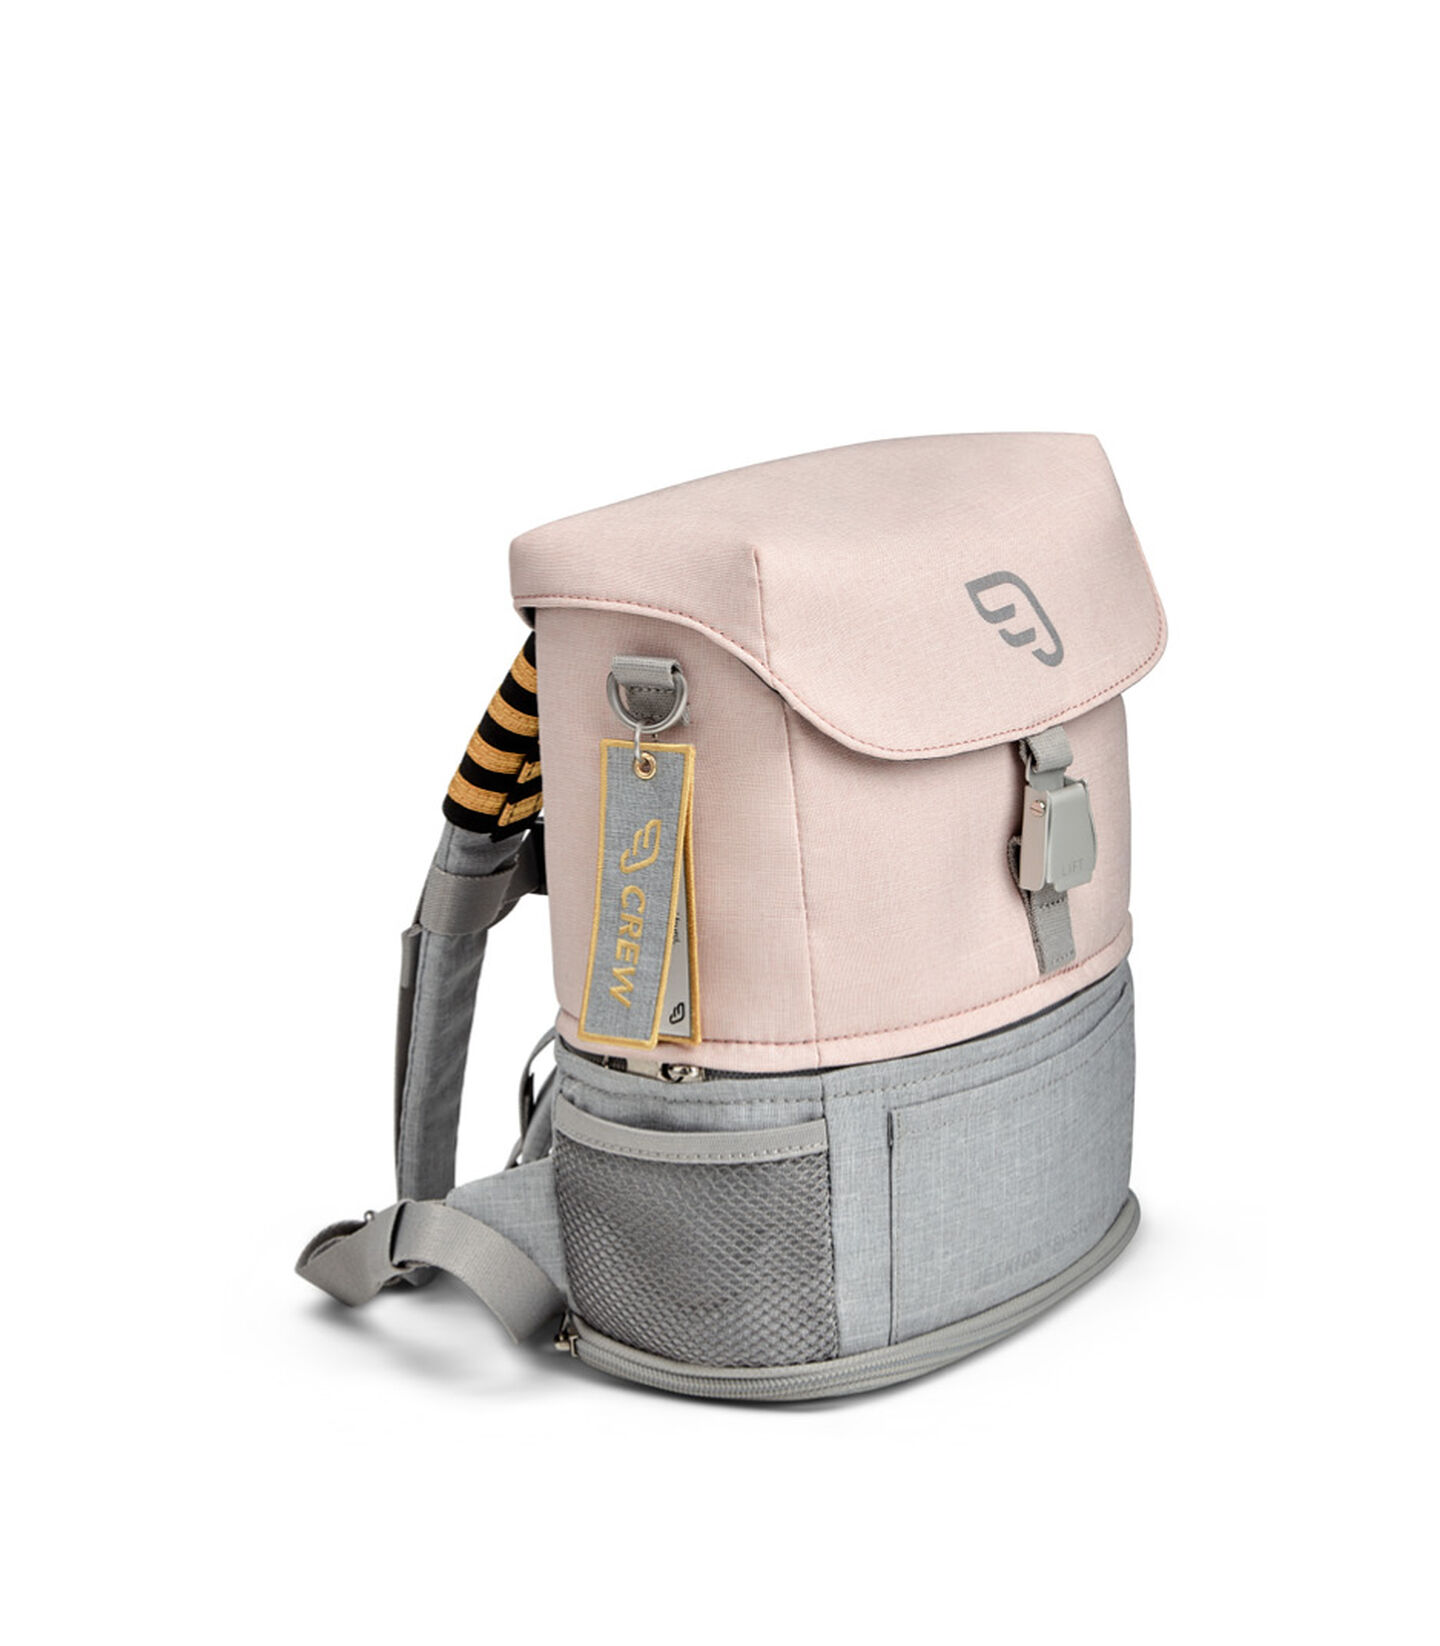 JetKids™ by Stokke® Crew BackPack Pink Lemonade view 1